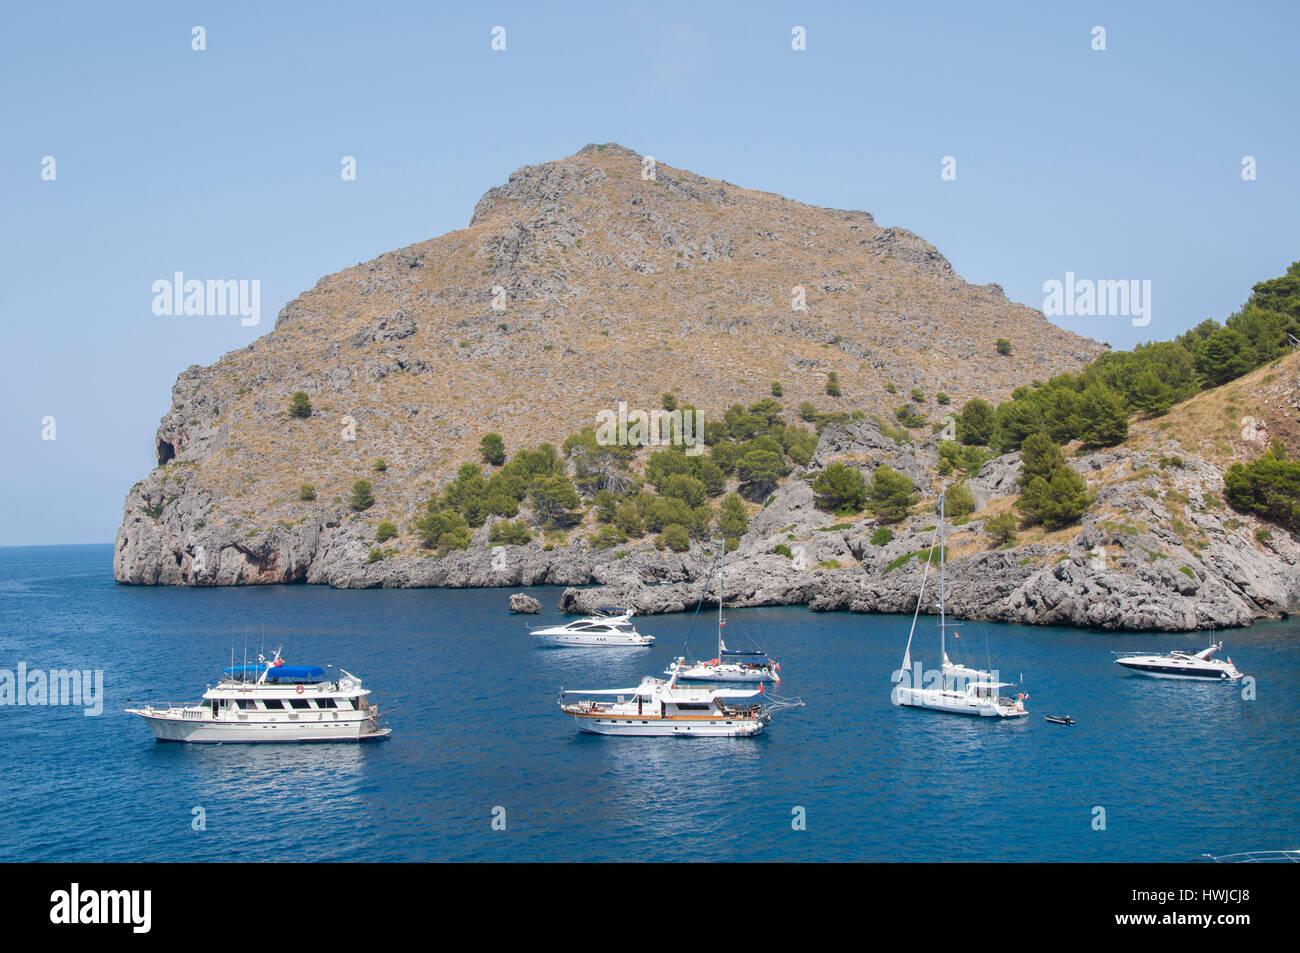 Bay of Sa Calobra, Torrent de Pareis, Escorca, Sa Calobra, Serra de Tramuntana, Balearic Islands, Mallorca, Mediterranean - Stock Image